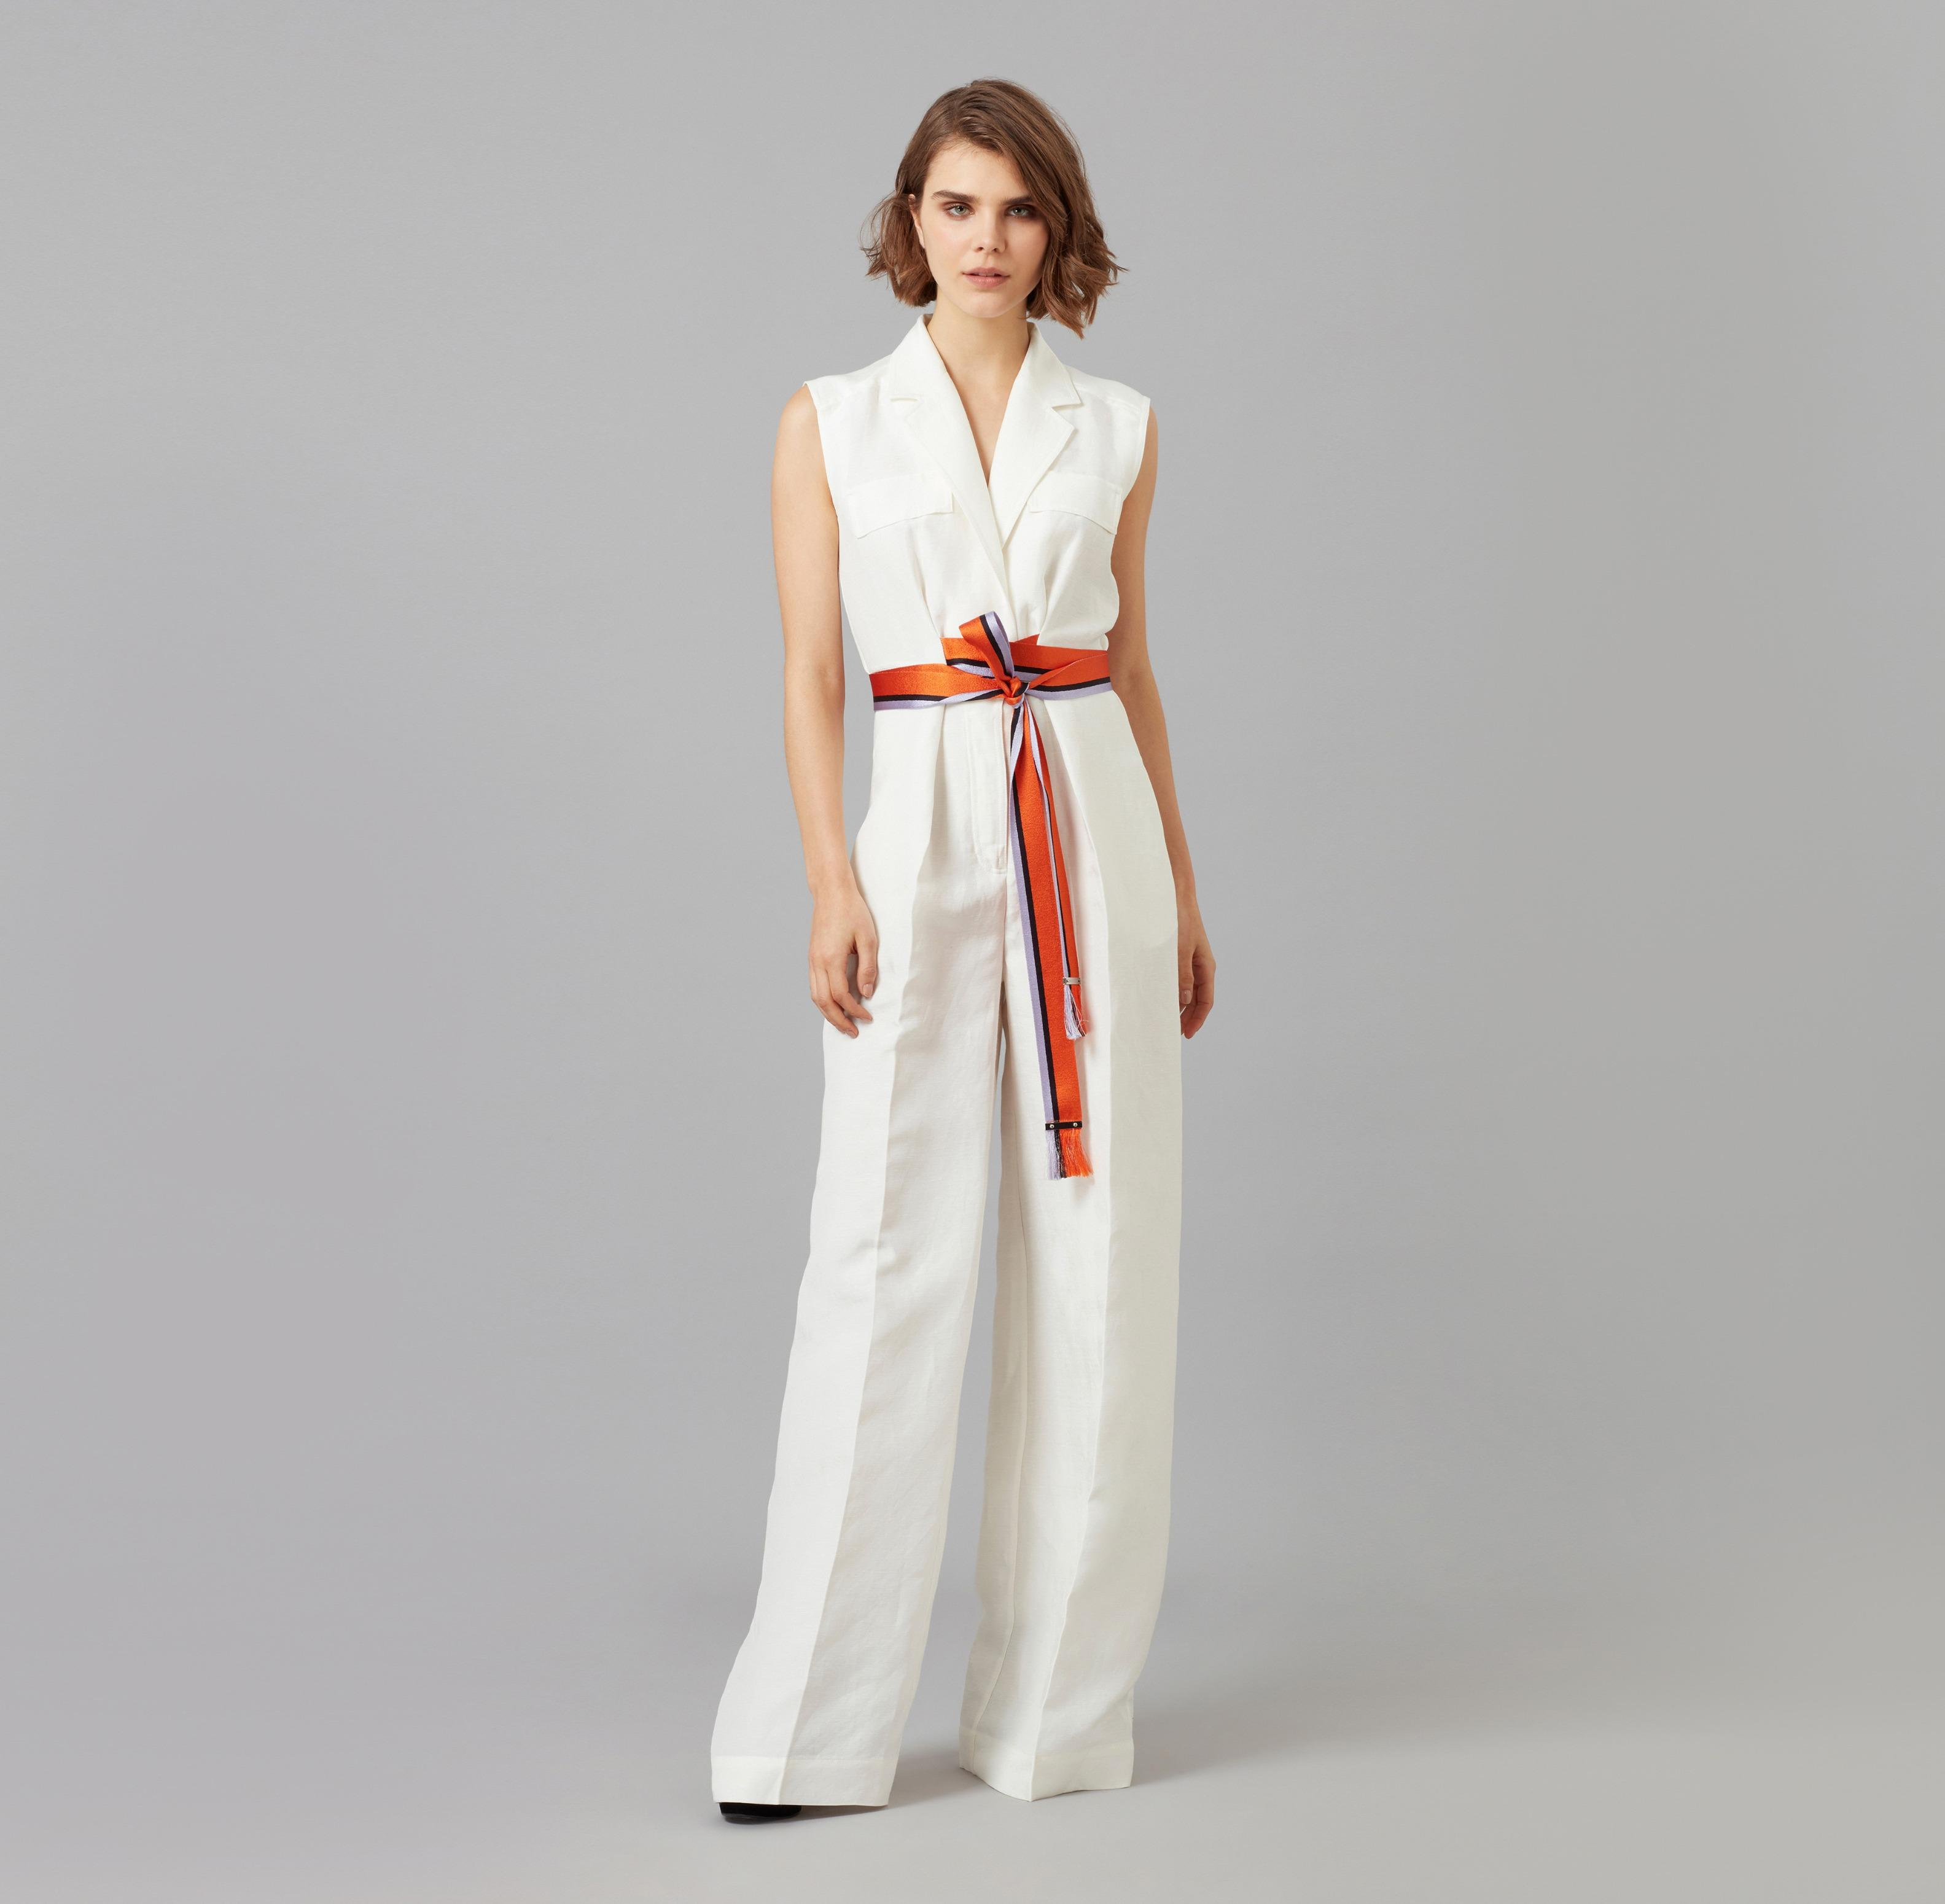 f06c221235c5 Amanda Wakeley Soft White Linen Viscose Jumpsuit in White - Lyst